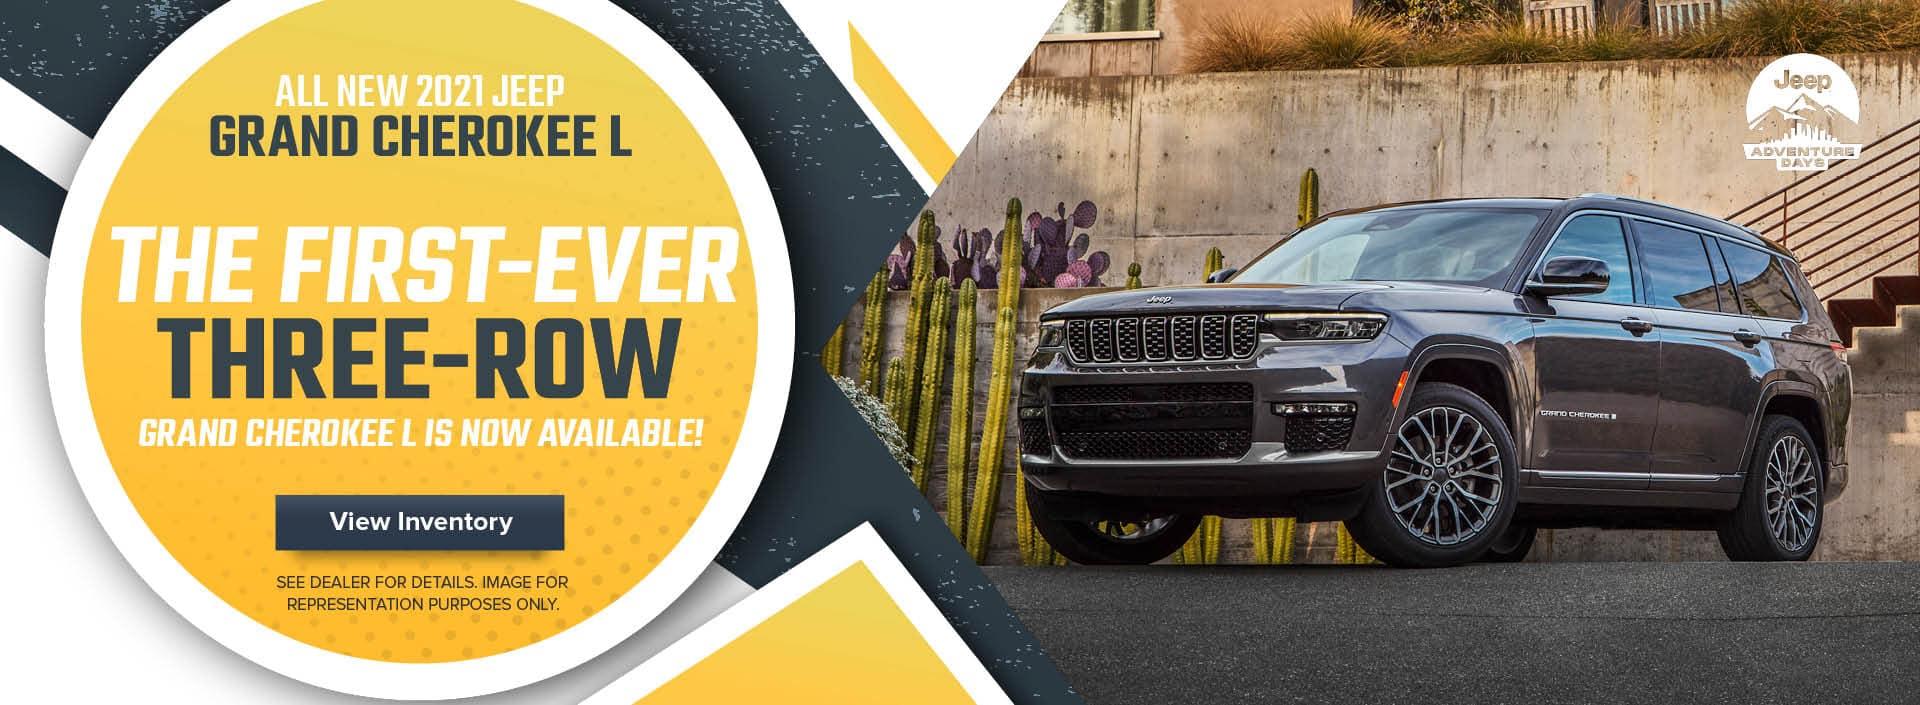 ALL NEW 2021 Jeep Grand Cherokee L